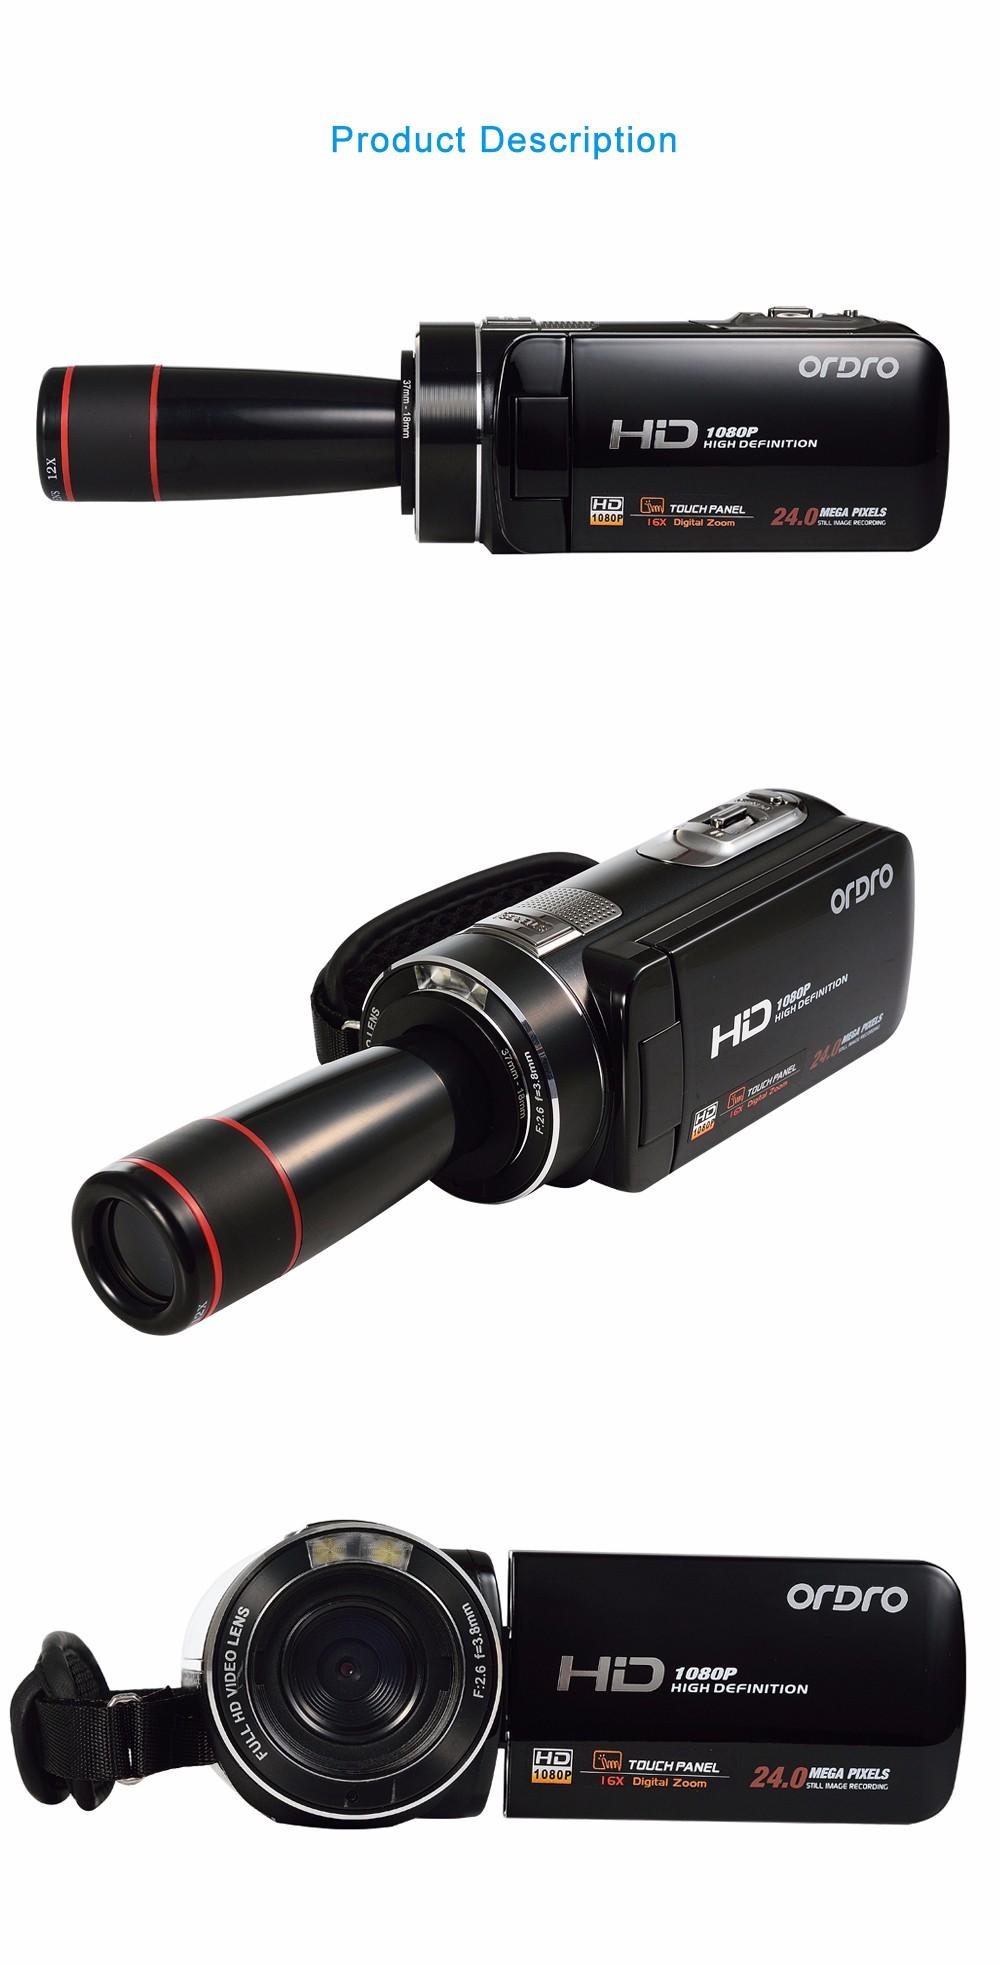 Ordro Camcorder HDV-Z18 Plus 1080P FHD Digital Video Camera Recording with 12X Teleconverter Remote Control HDMI Output 10